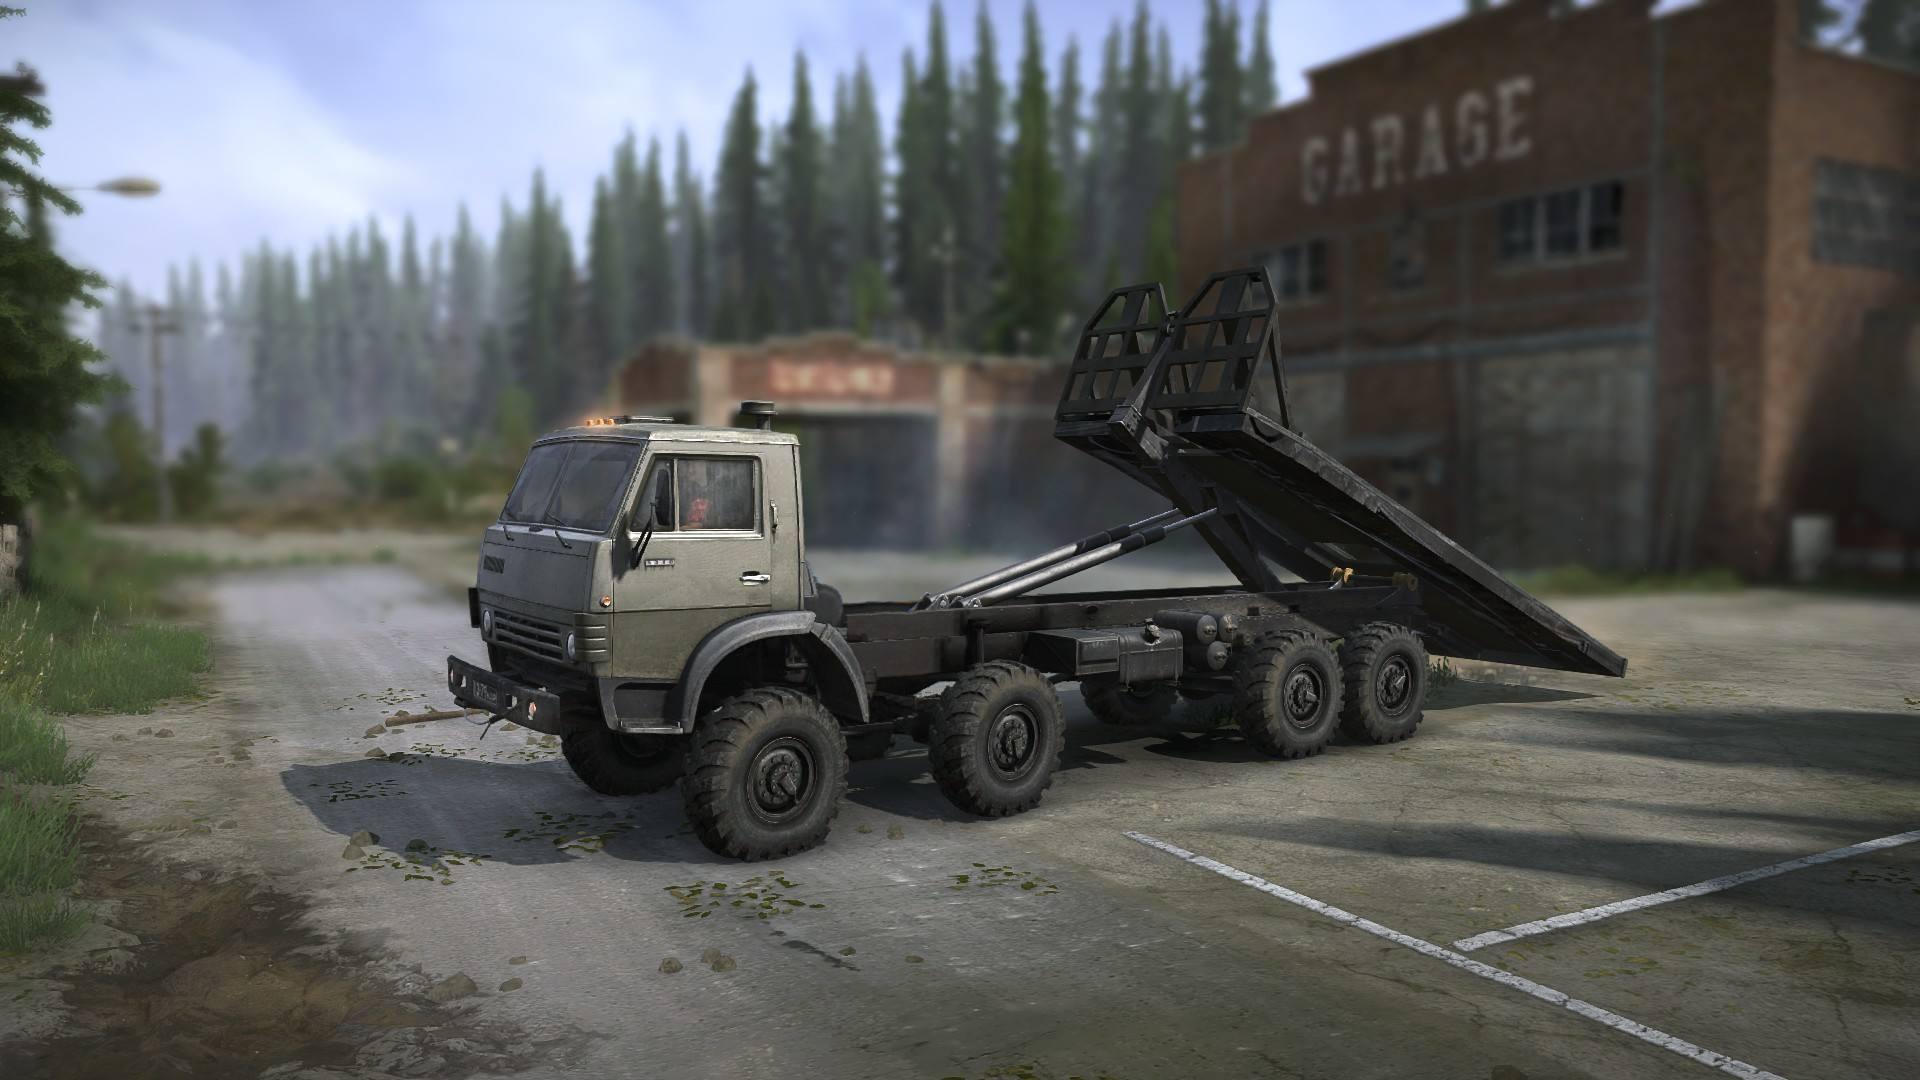 КАМАЗ 63501 (Мультилифт)